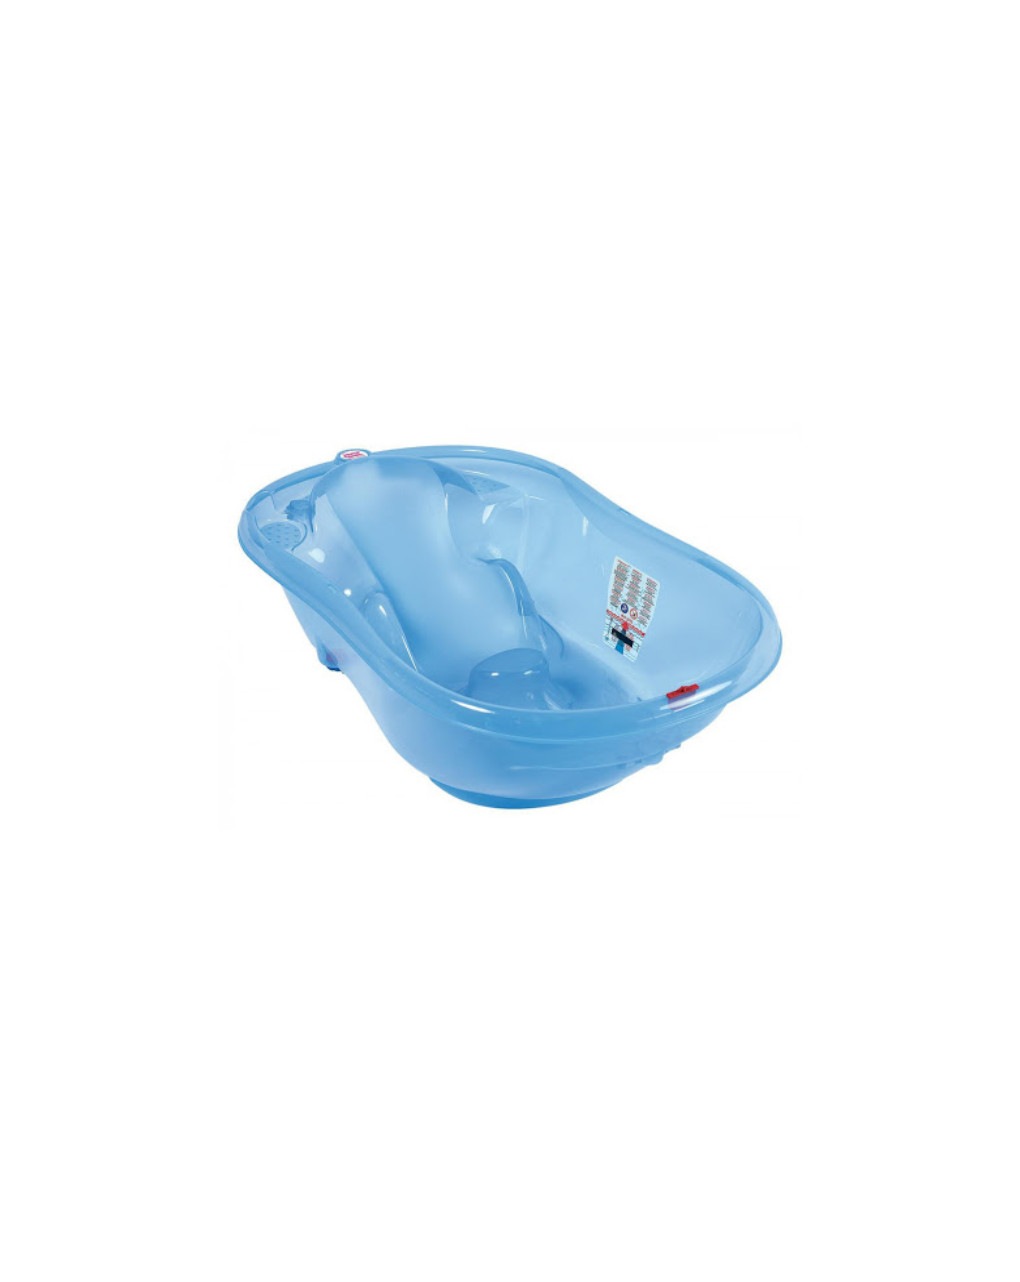 Onda vaschetta blu trasparente - Okbaby